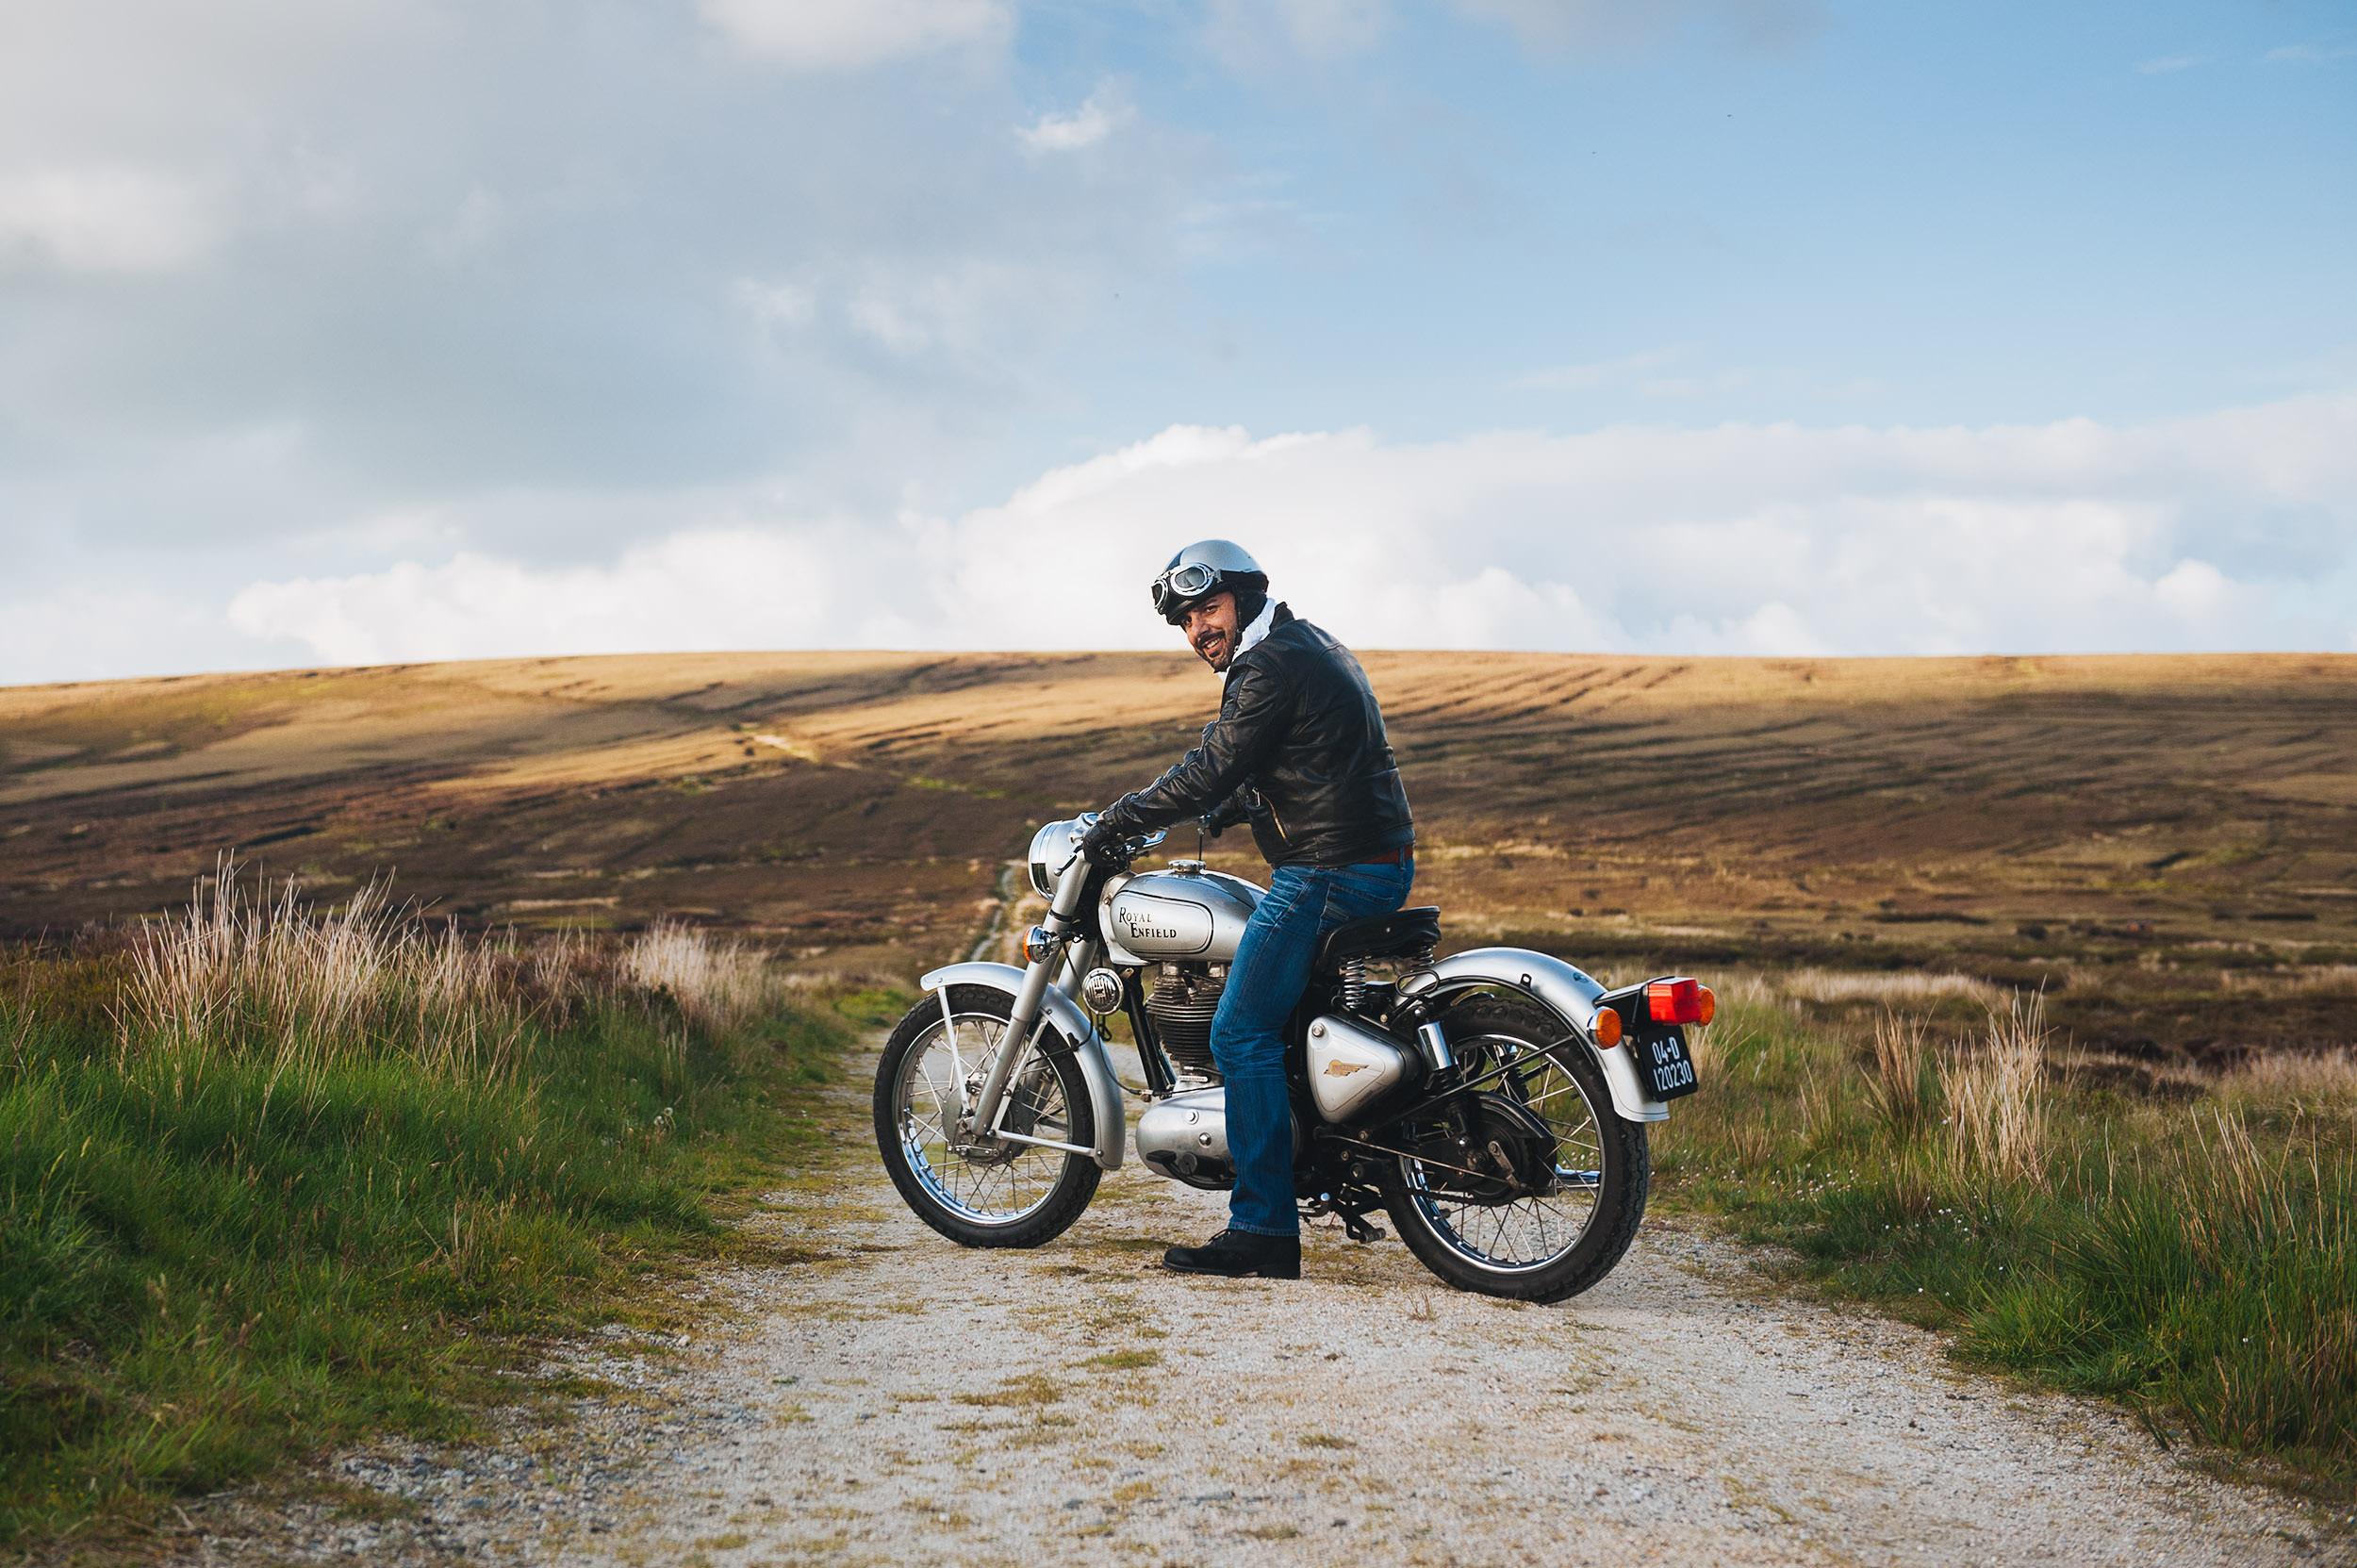 29-outdoor-classic-motorbike-royal-enfield-ireland-wicklow.jpg